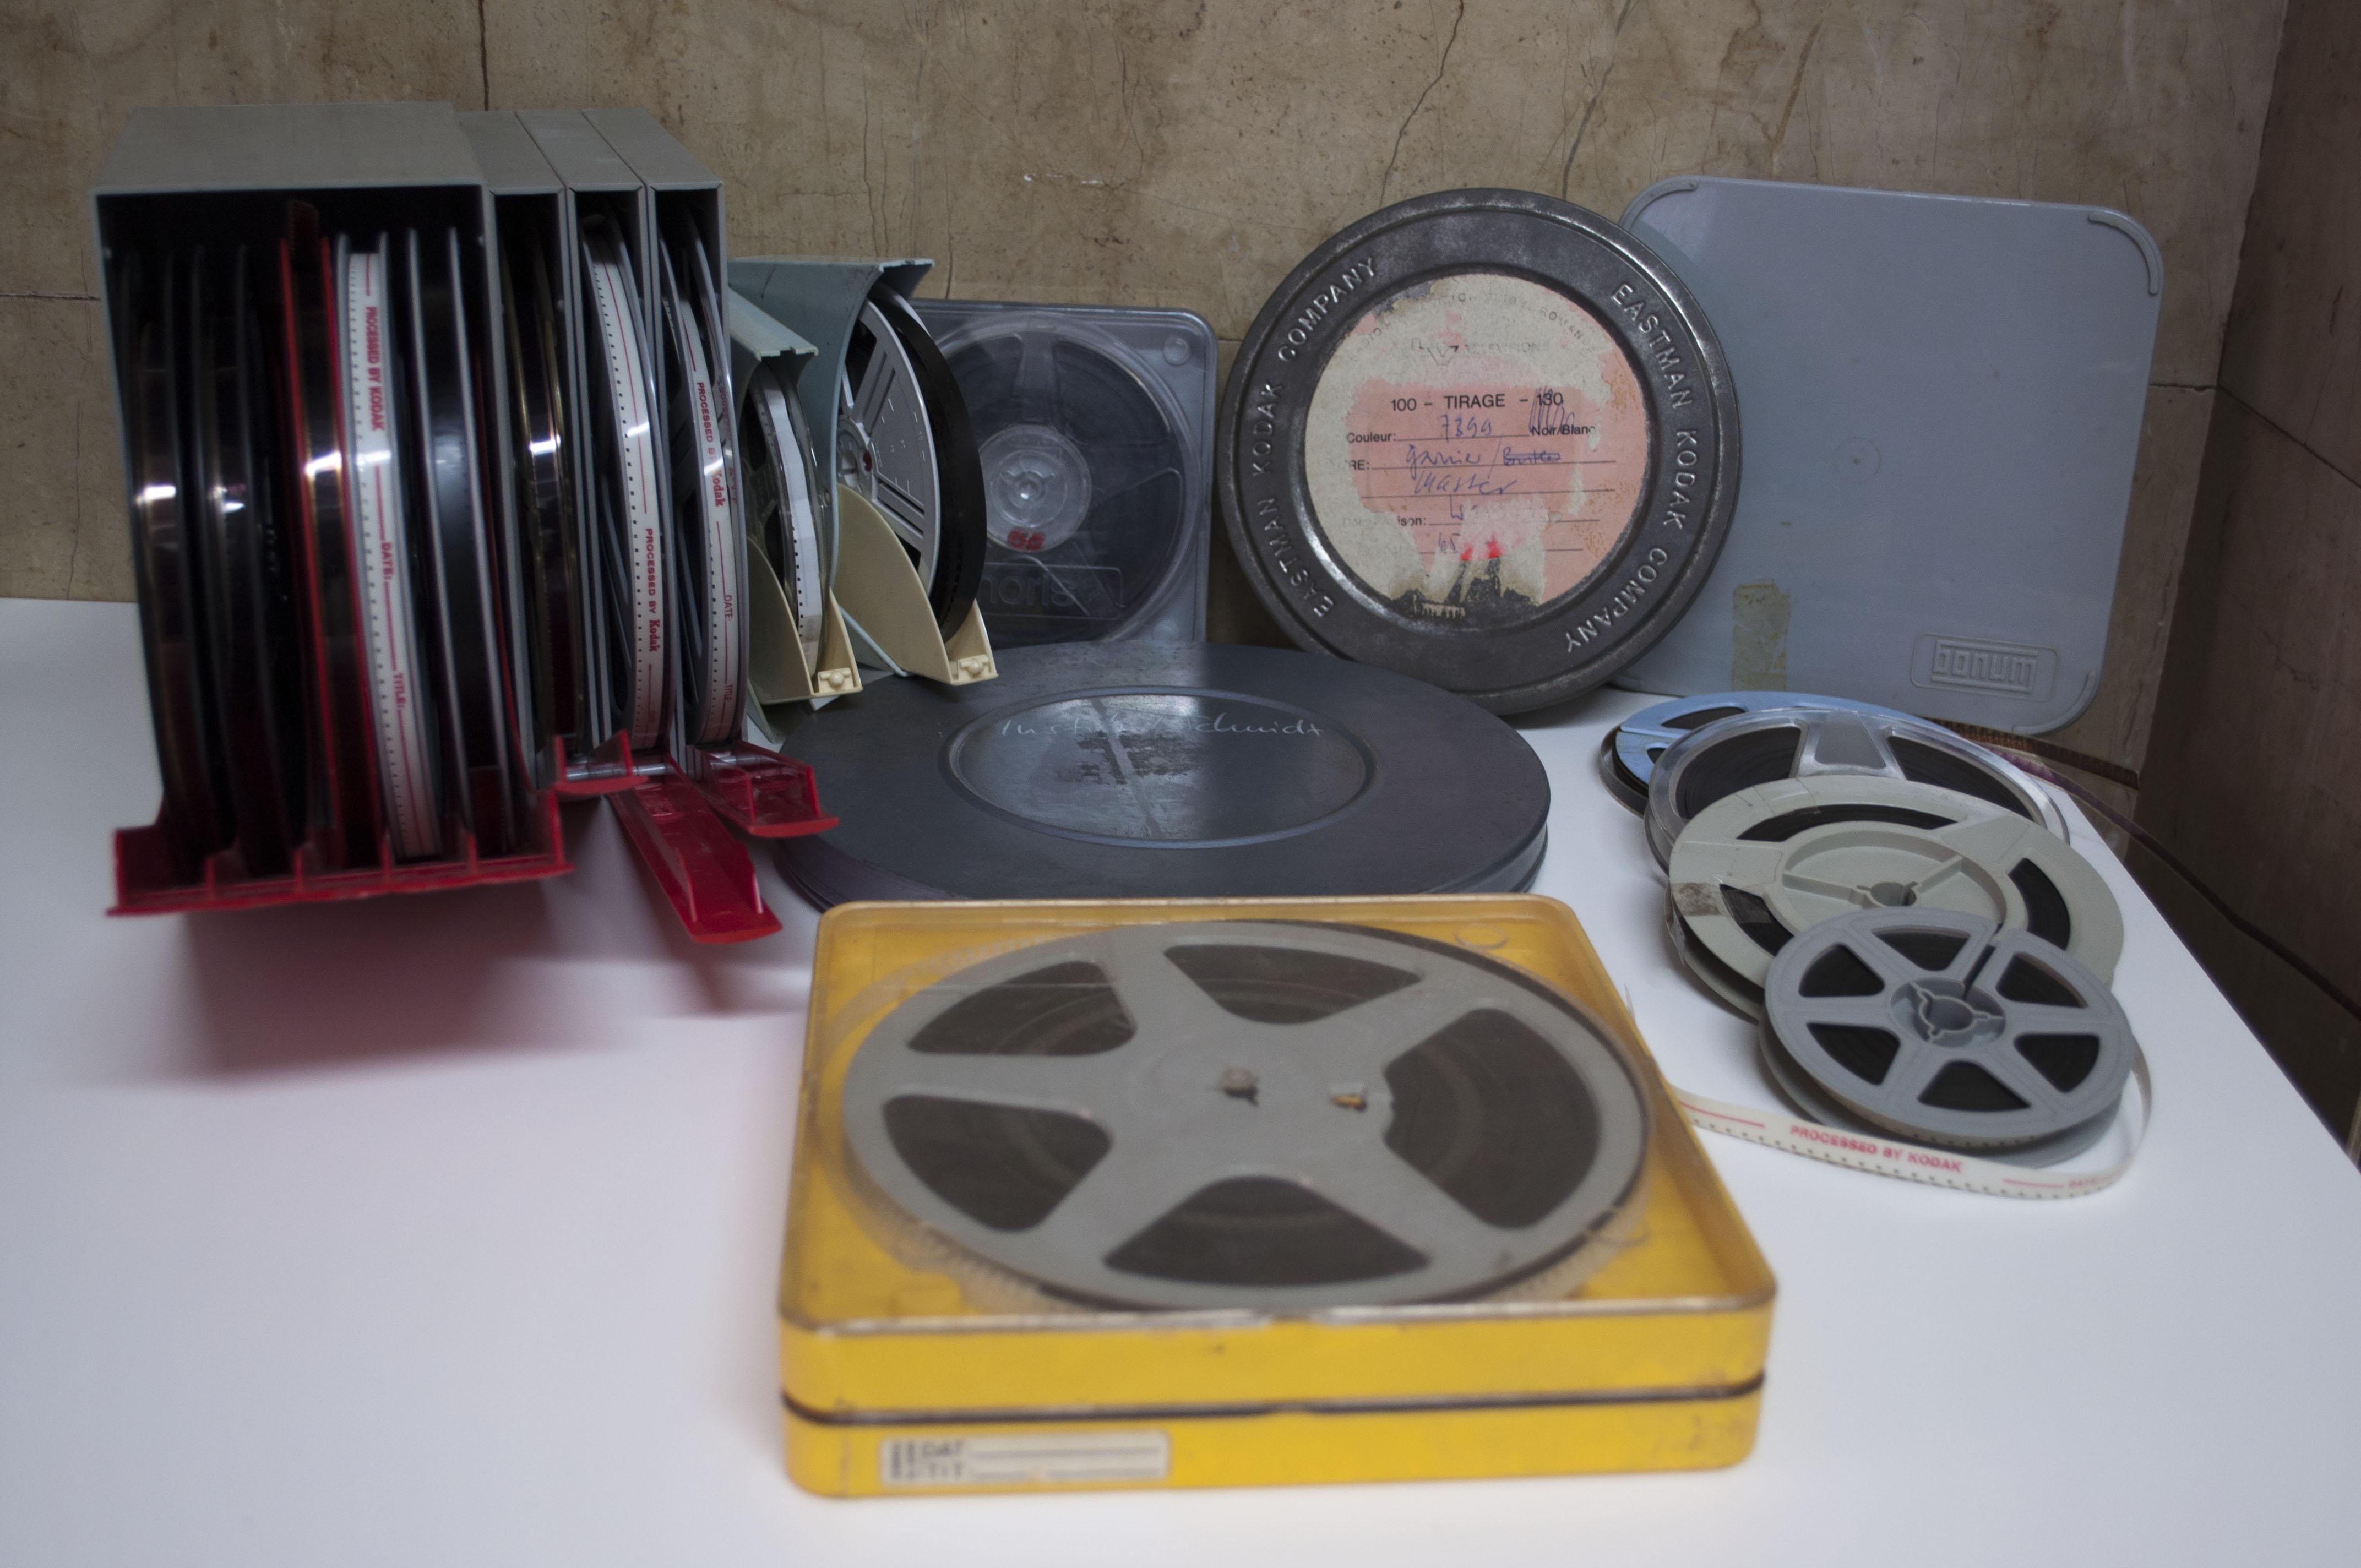 Transfer 8mm, Super 8, 16mm film to digital format